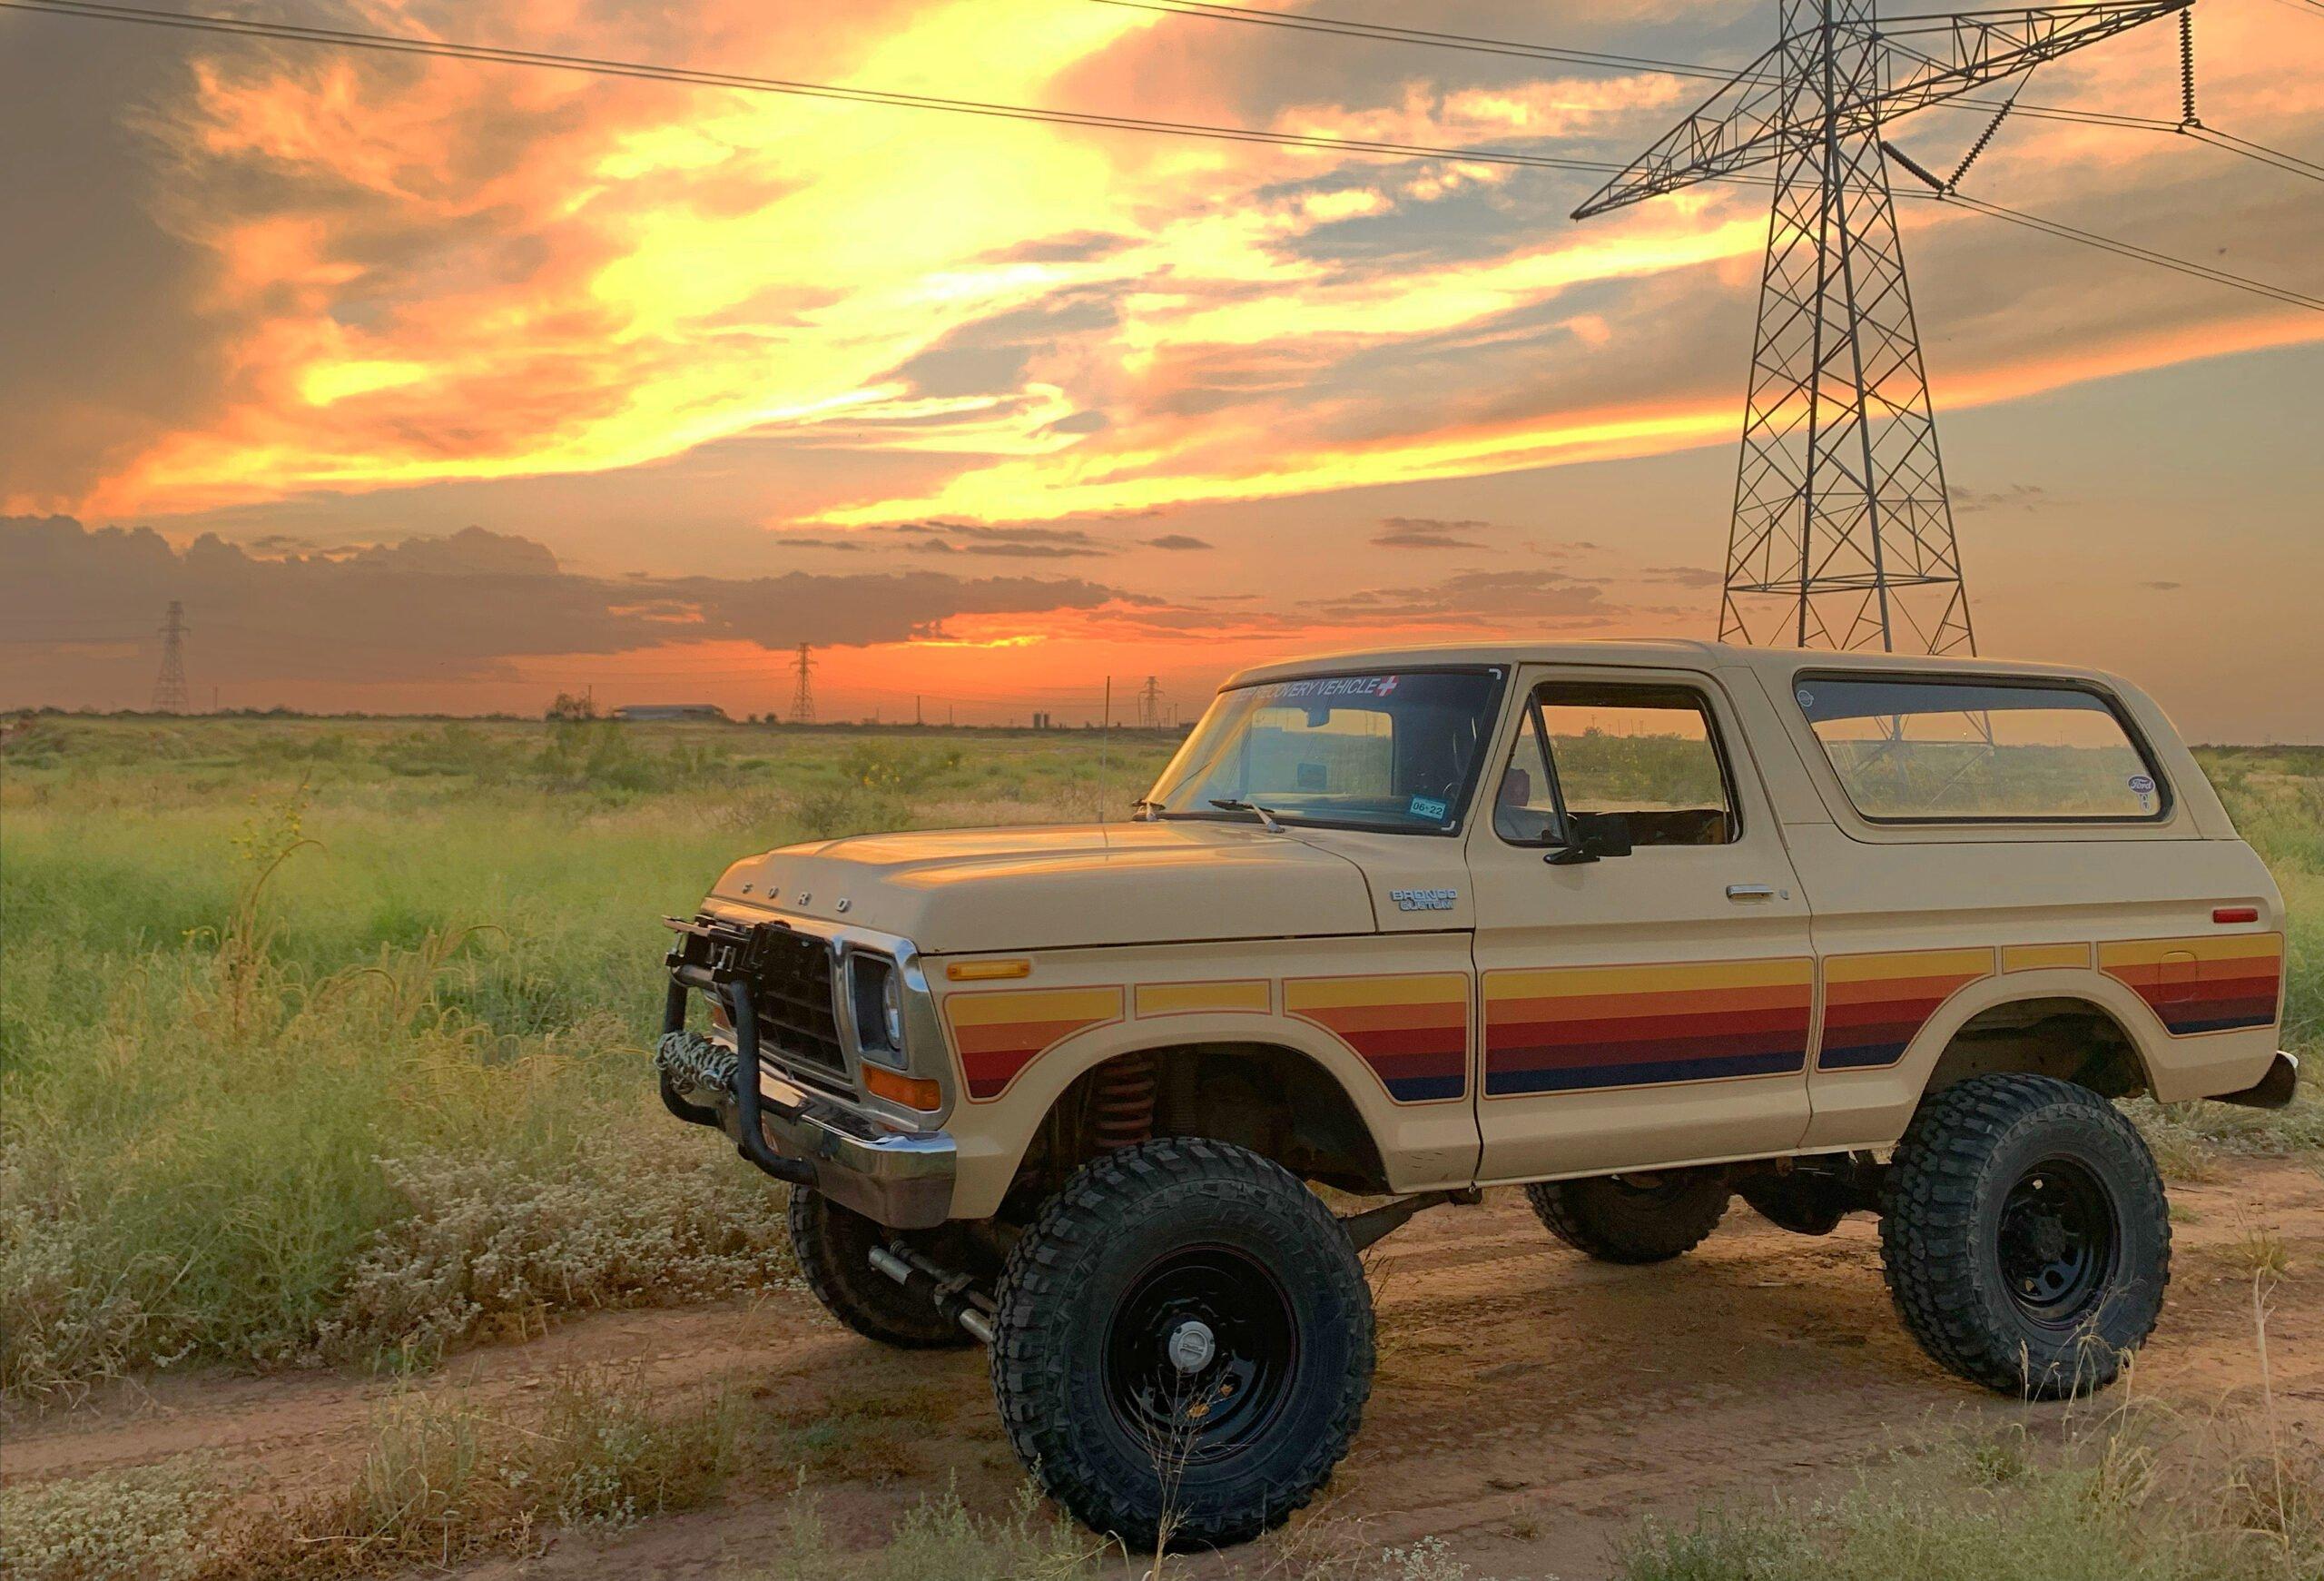 Rustin's 1978 Ford Bronco